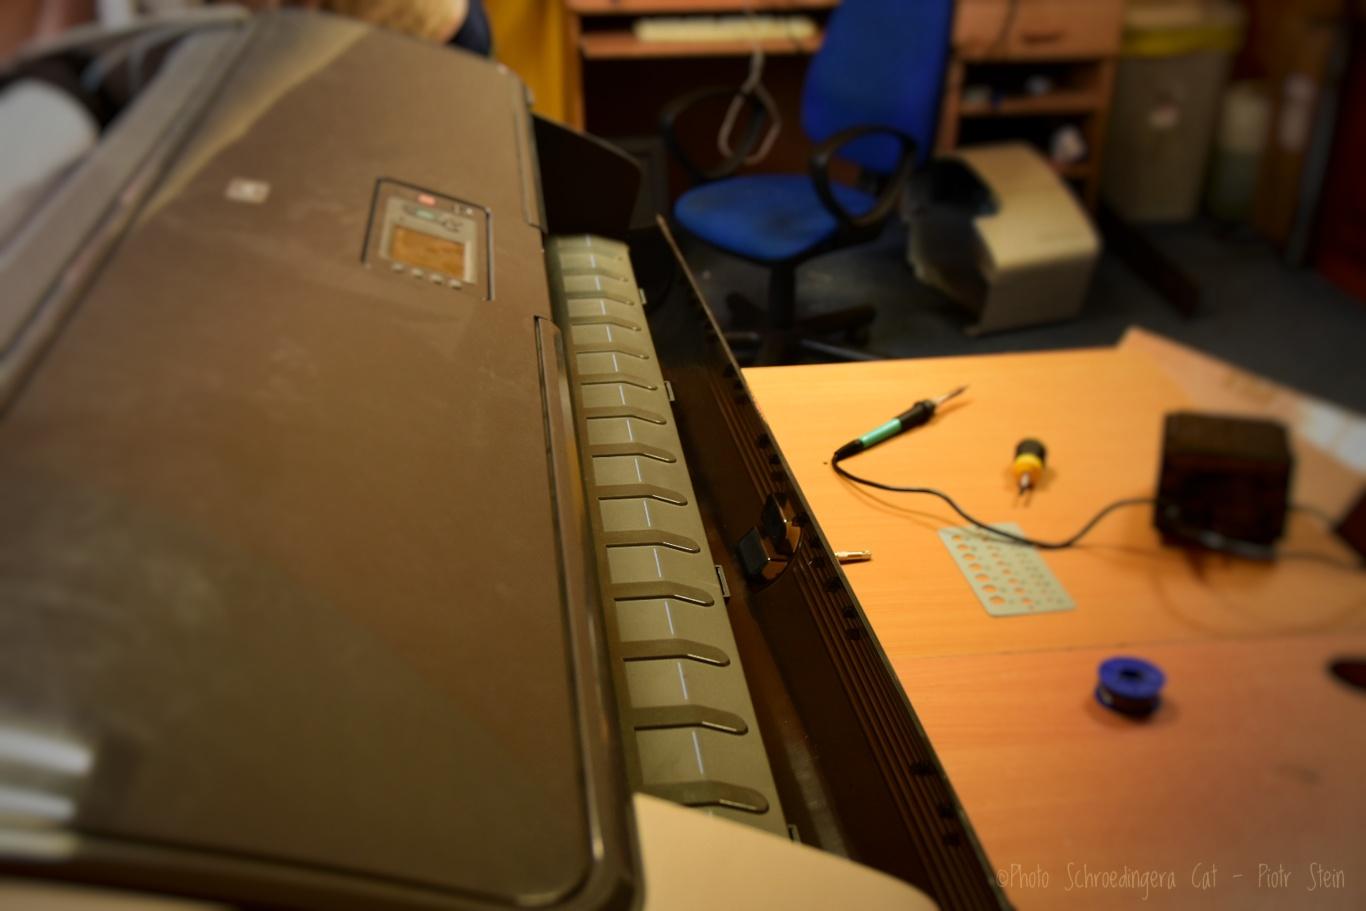 Serwis ploterów. Łatwa konserwacja drukarek HP.